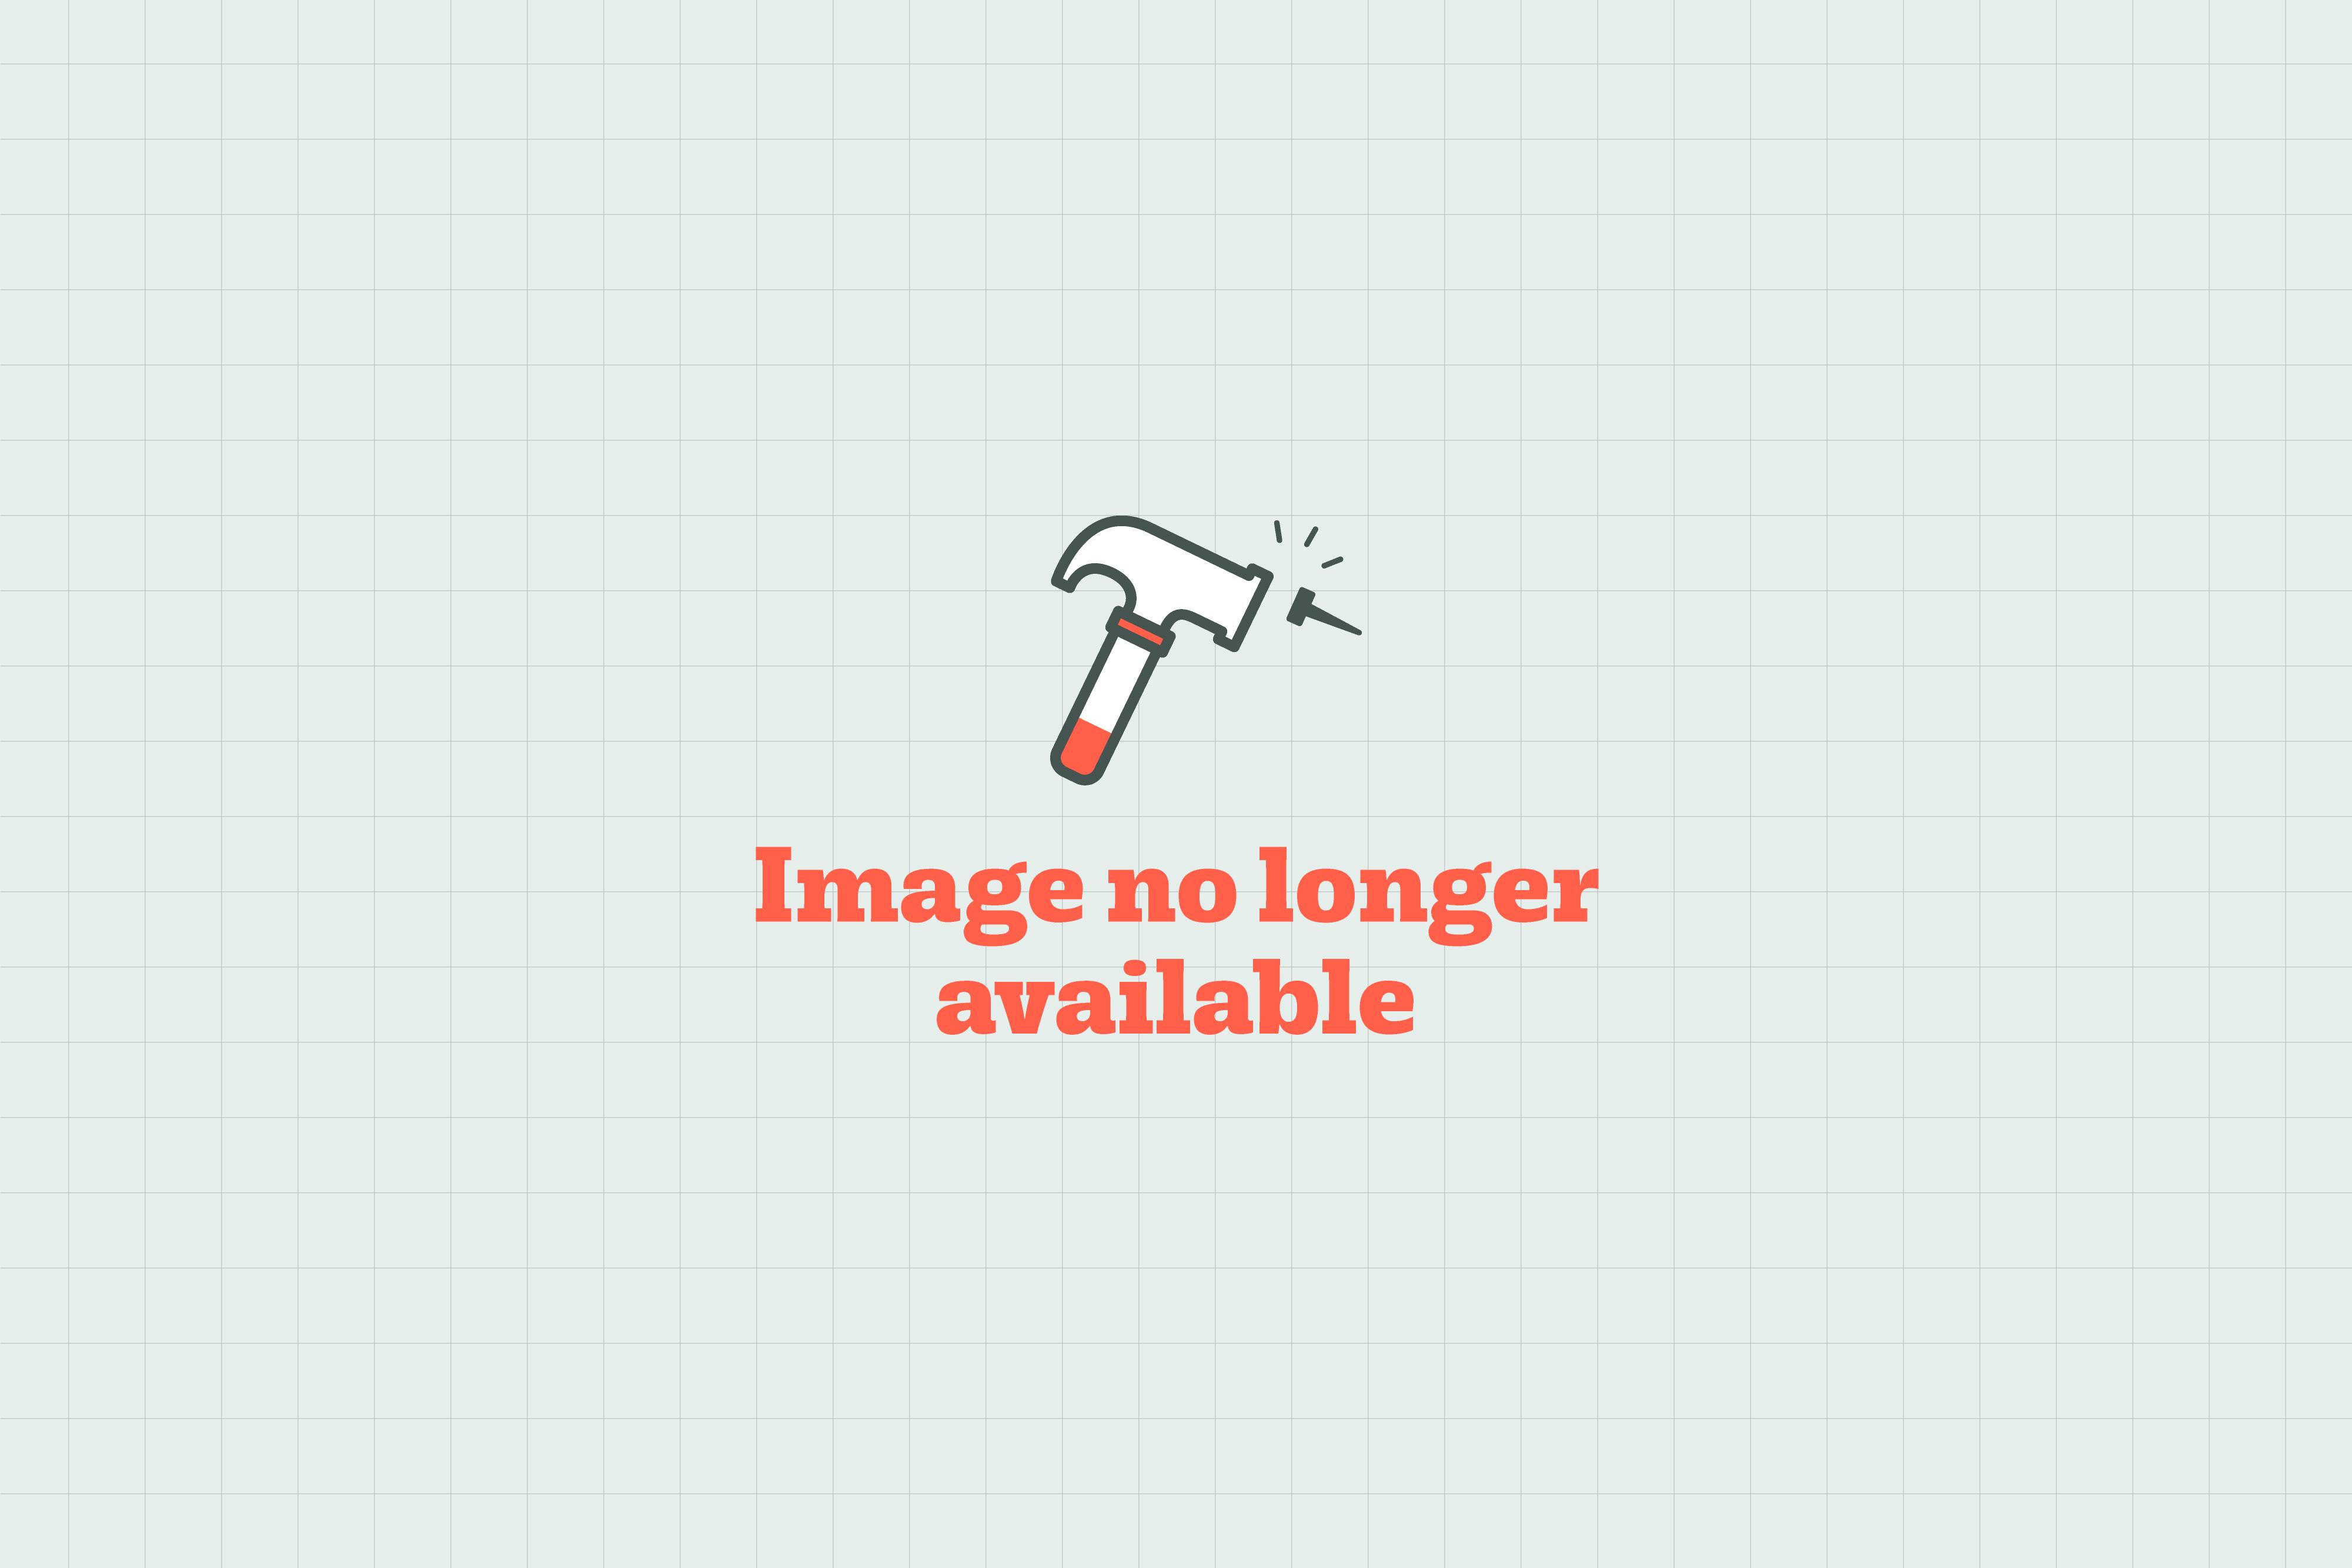 Luxury condo Brickell Flatiron is 75 percent